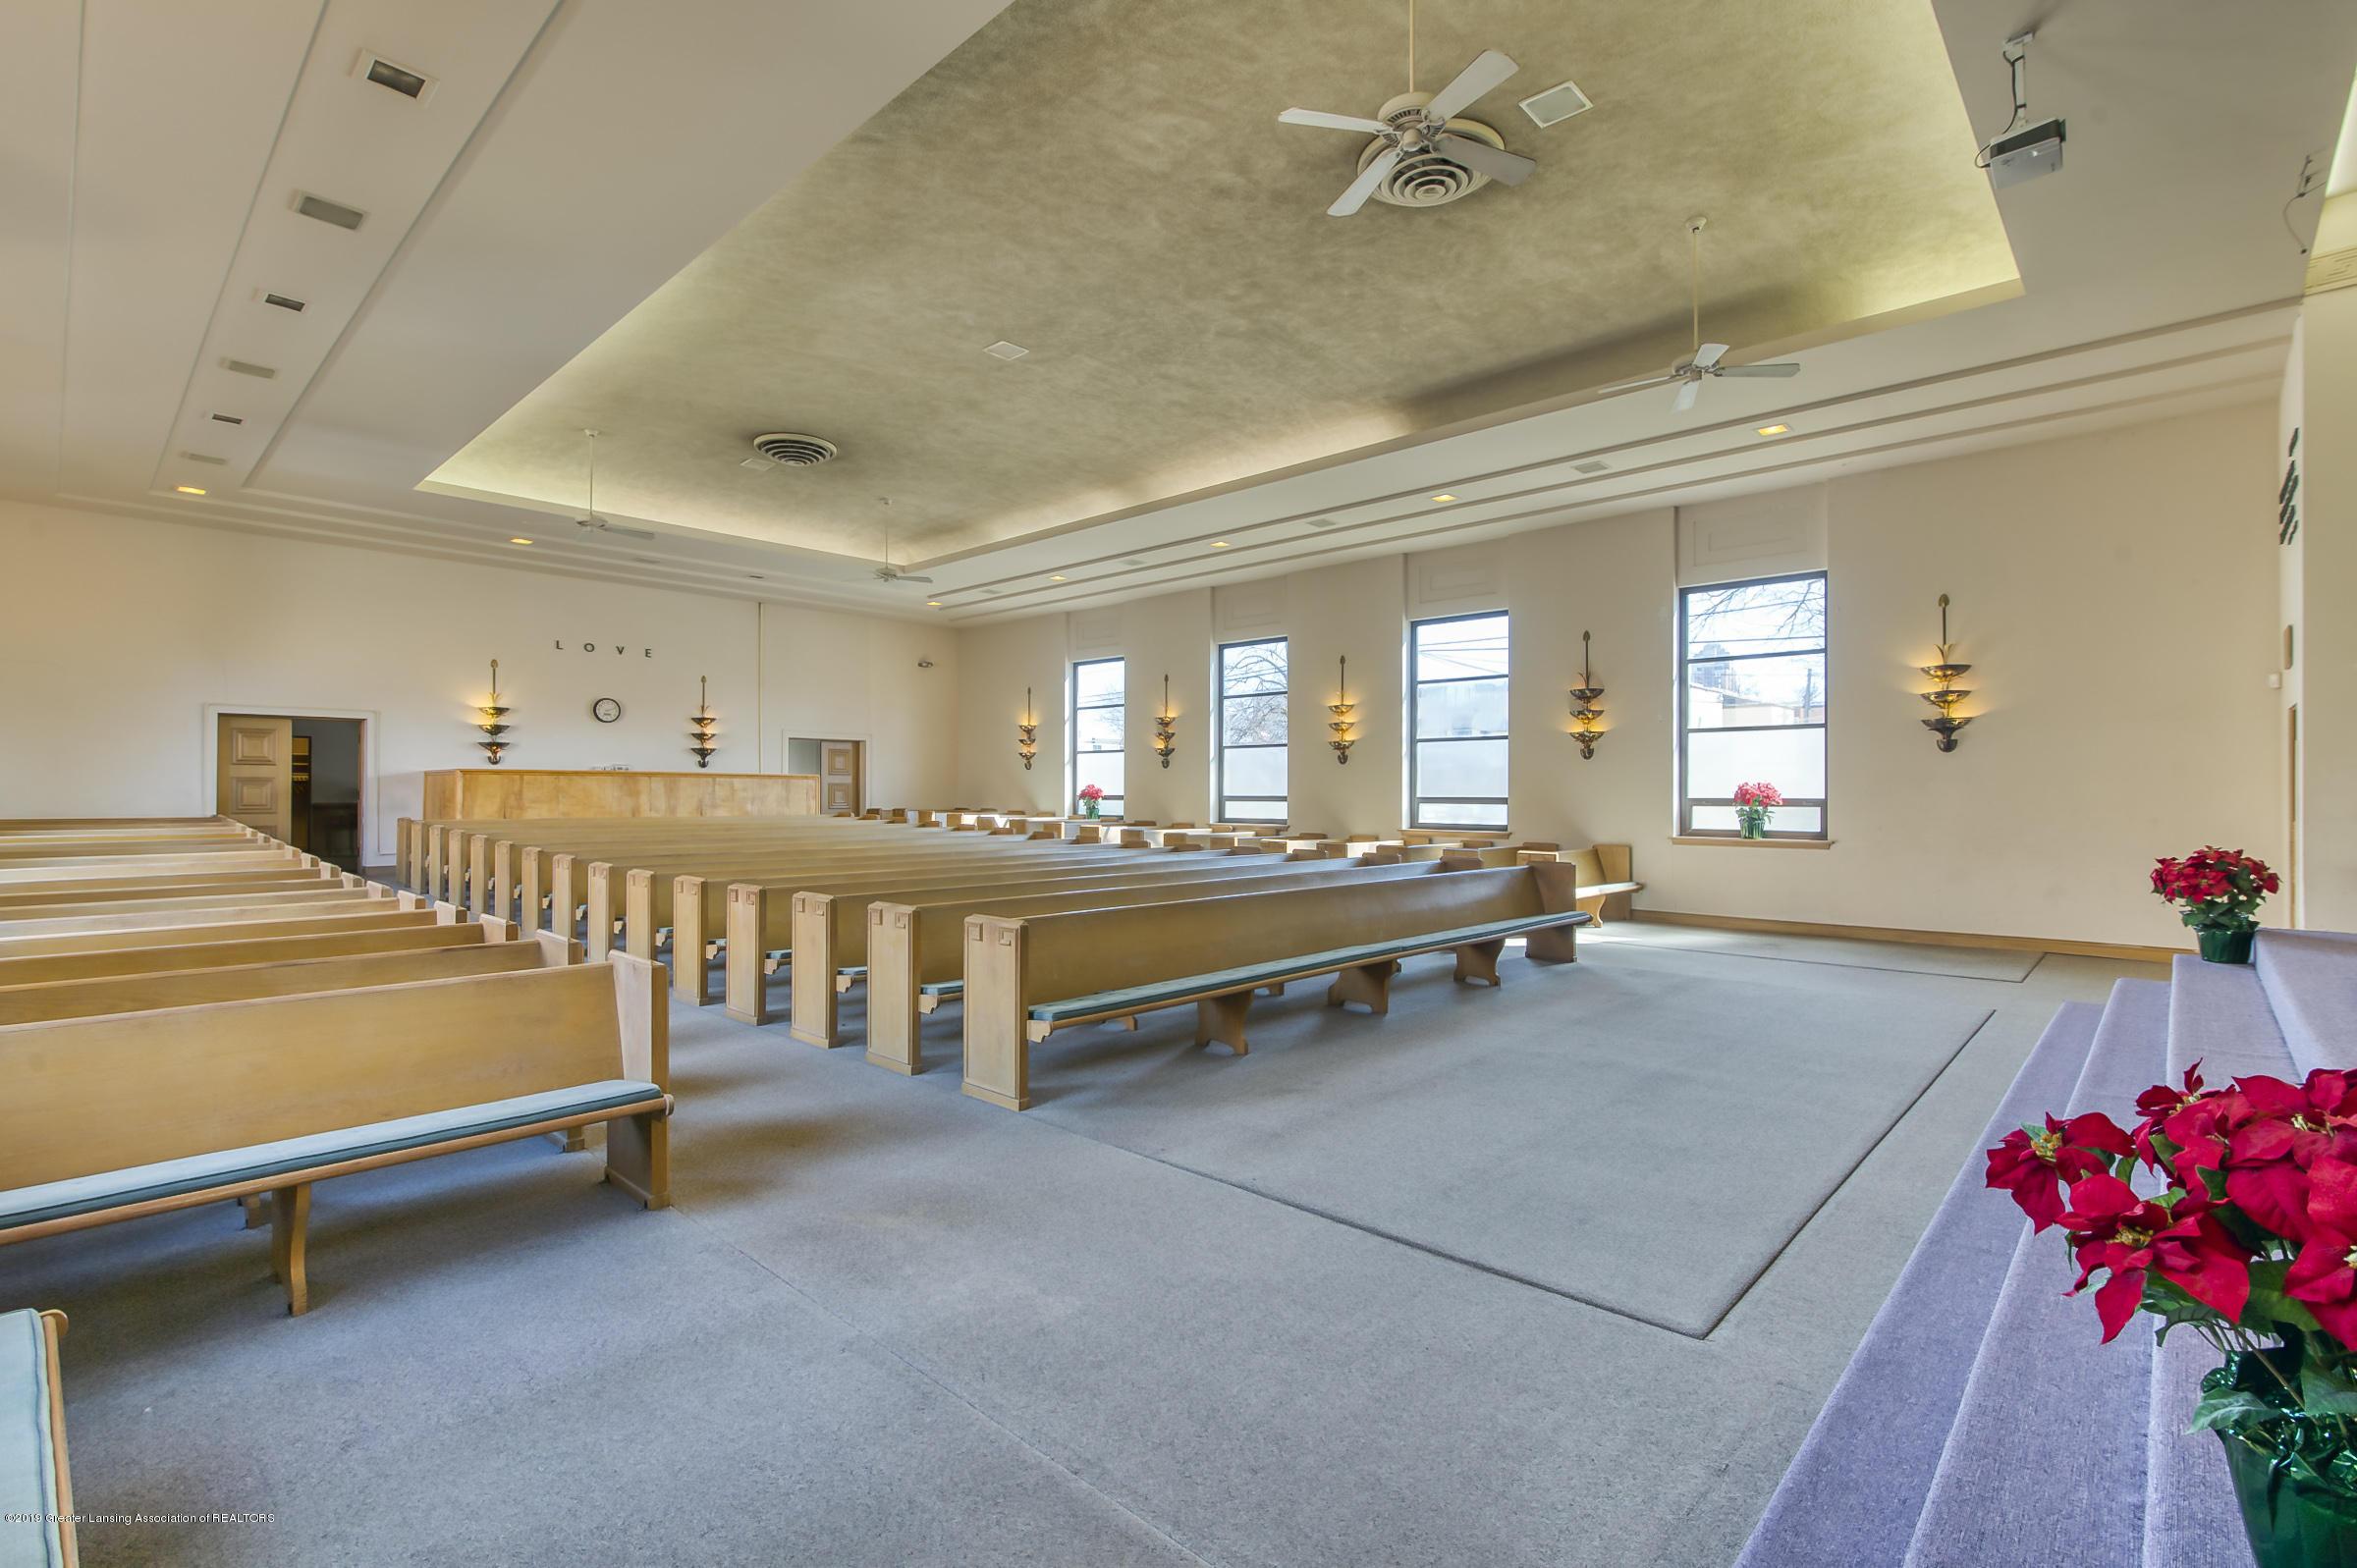 505 Seymour Ave - Sanctuary - 9